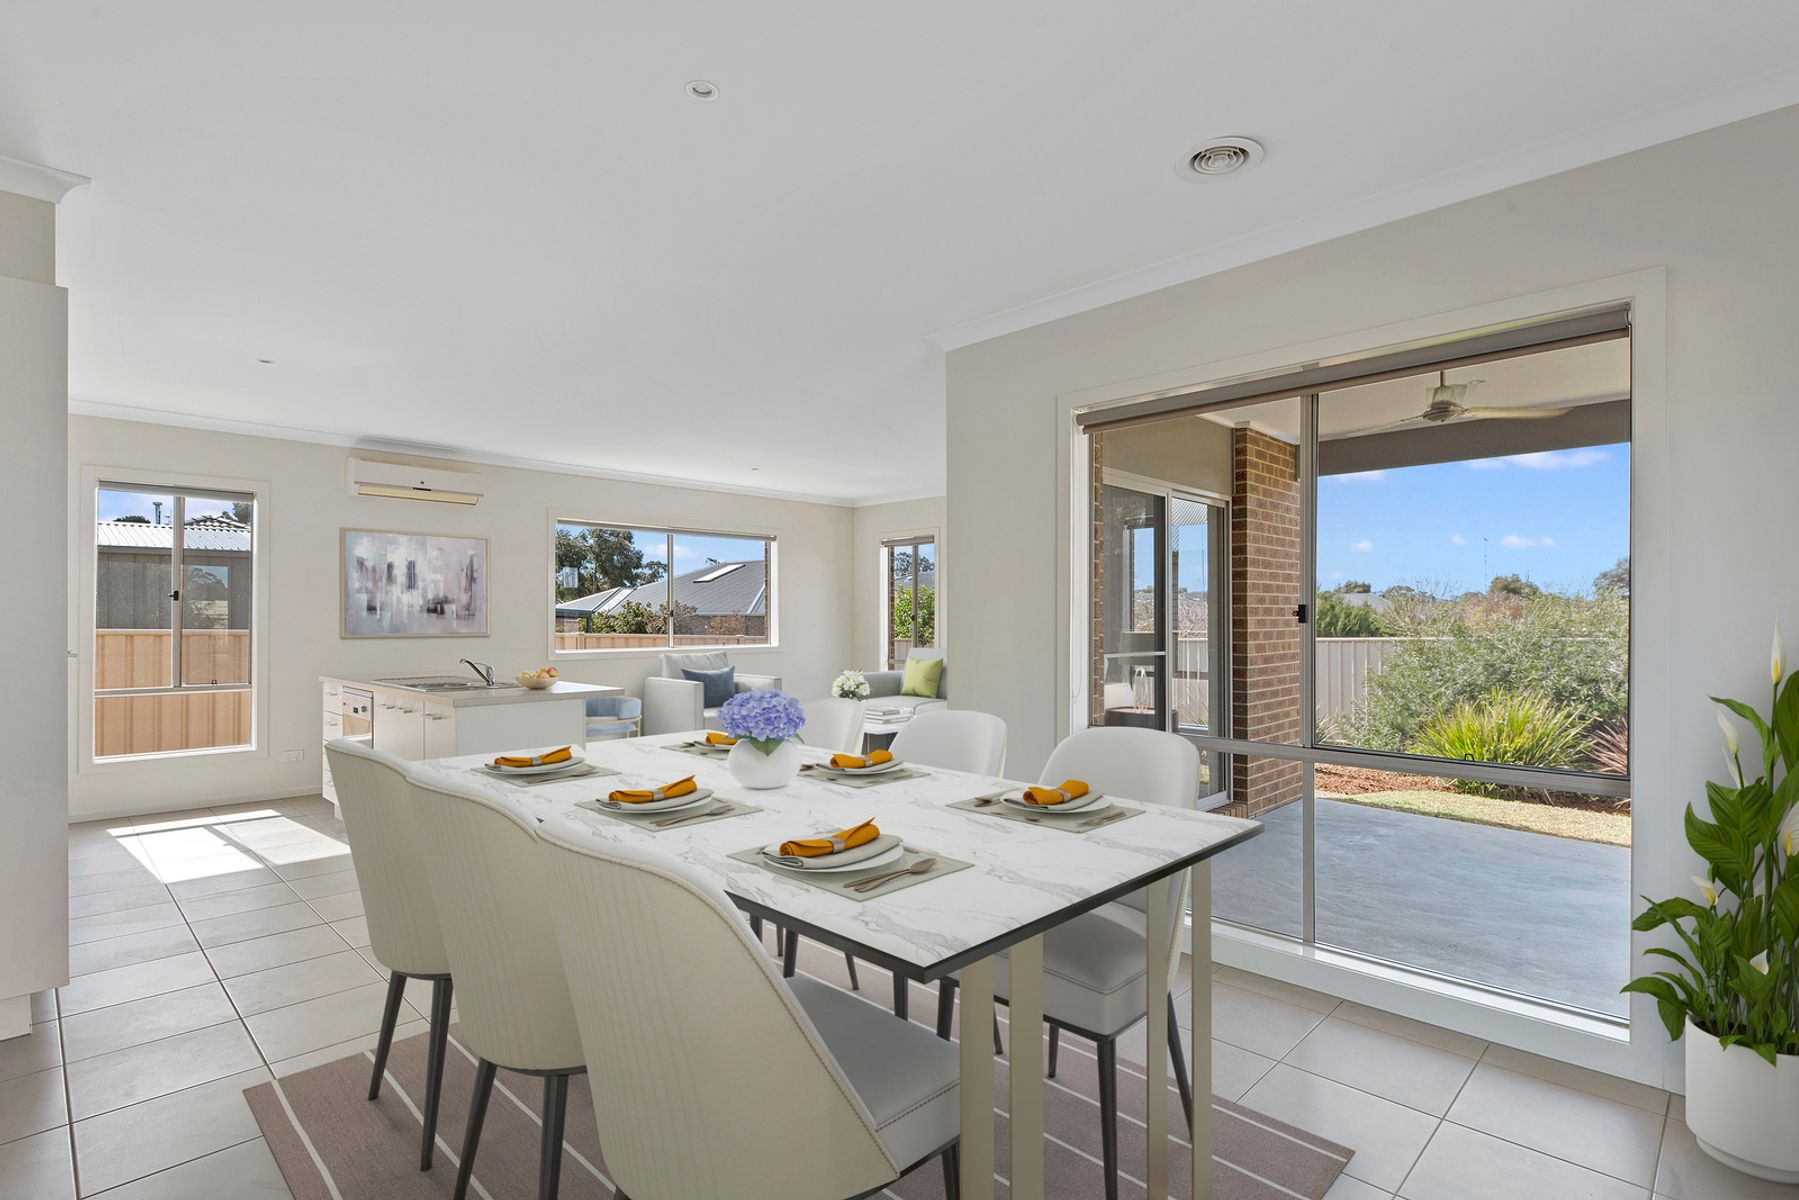 3 Cumberland Terrace, Strathfieldsaye, VIC 3551